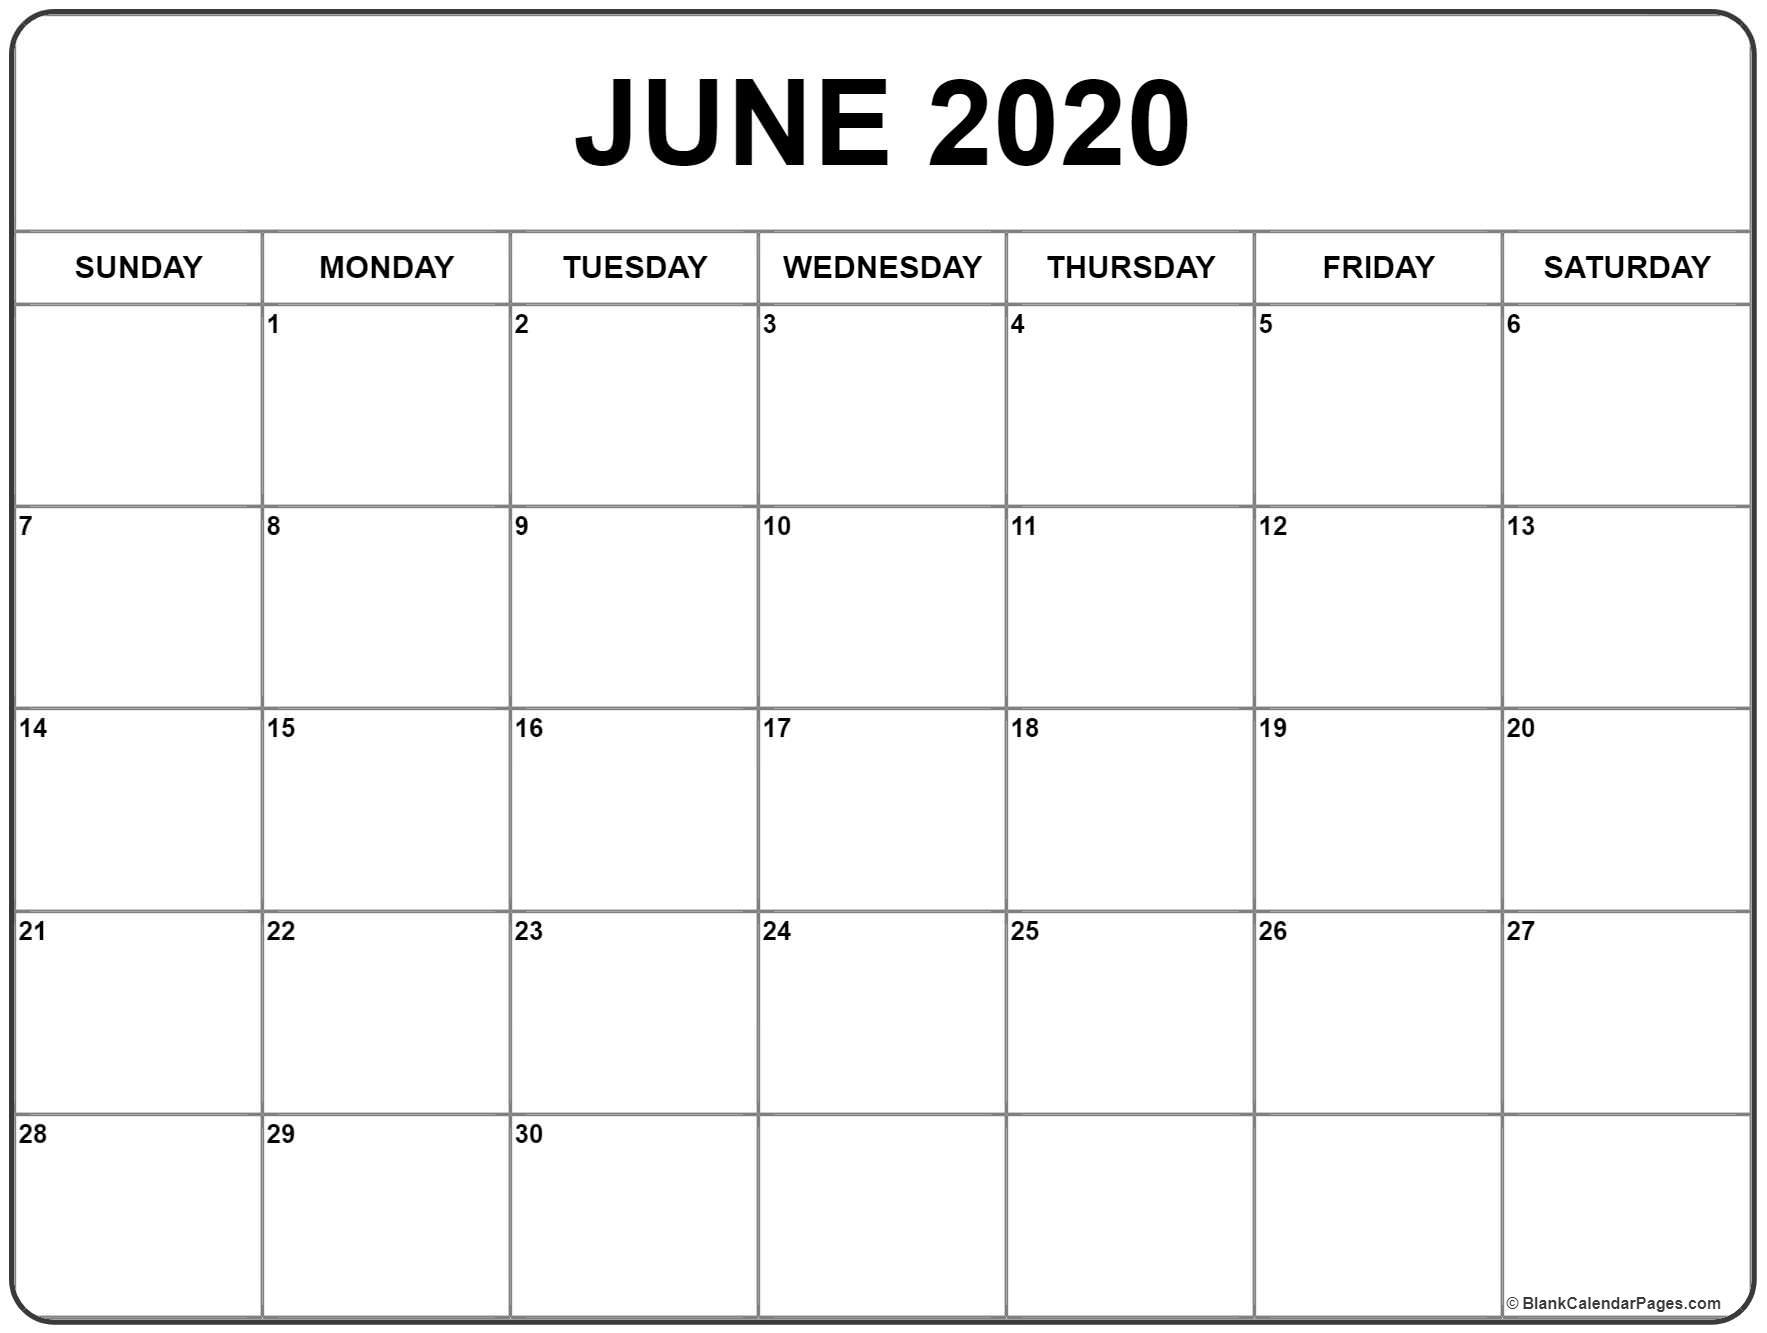 June 2020 Calendar   Free Printable Monthly Calendars regarding Year-Long Calendar 2020 Printable